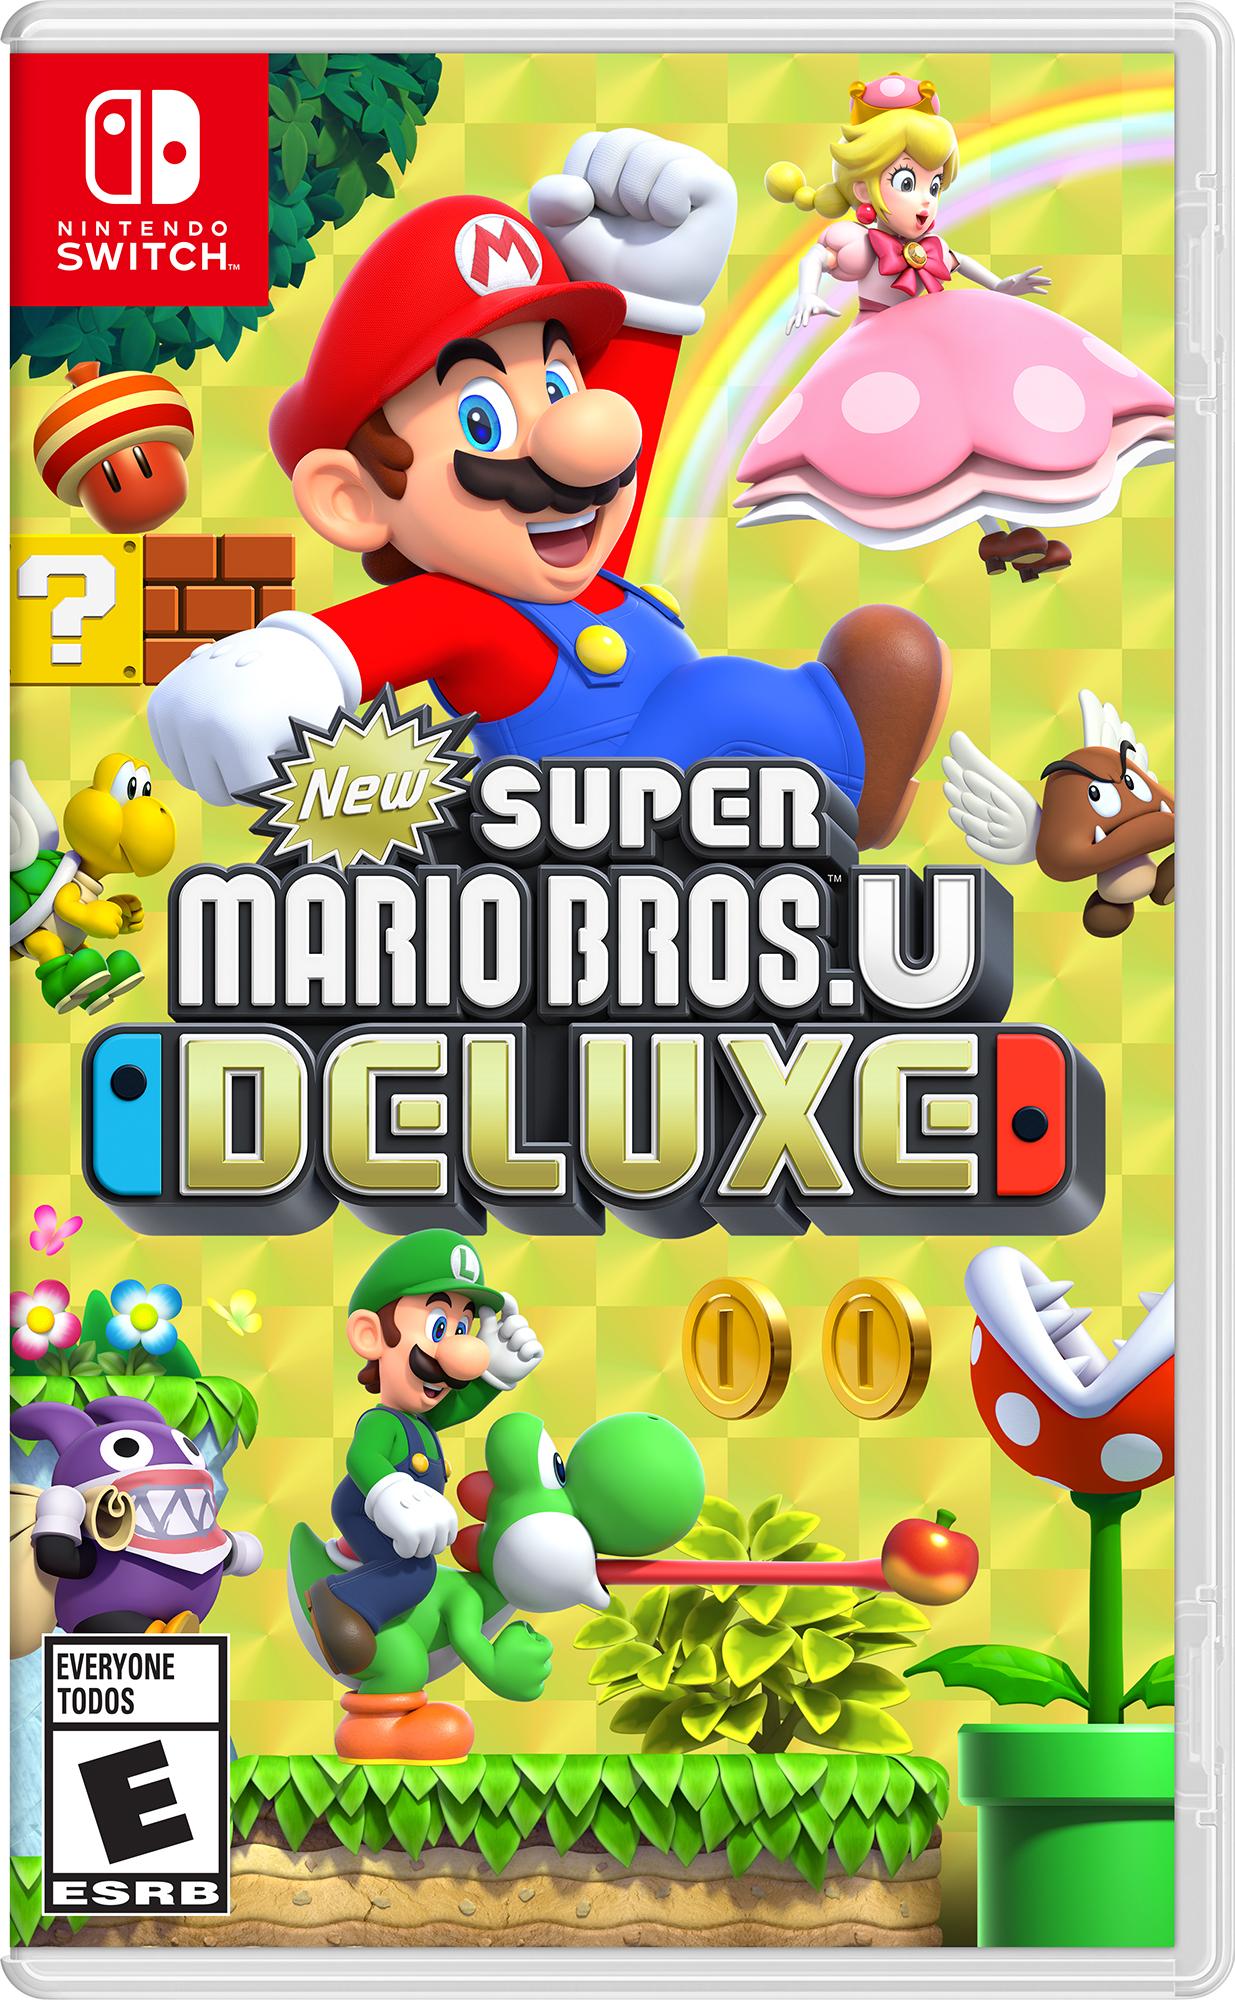 New Super Mario Bros U Deluxe (Nintendo Switch) $45 + Free Shipping via Walmart/Amazon